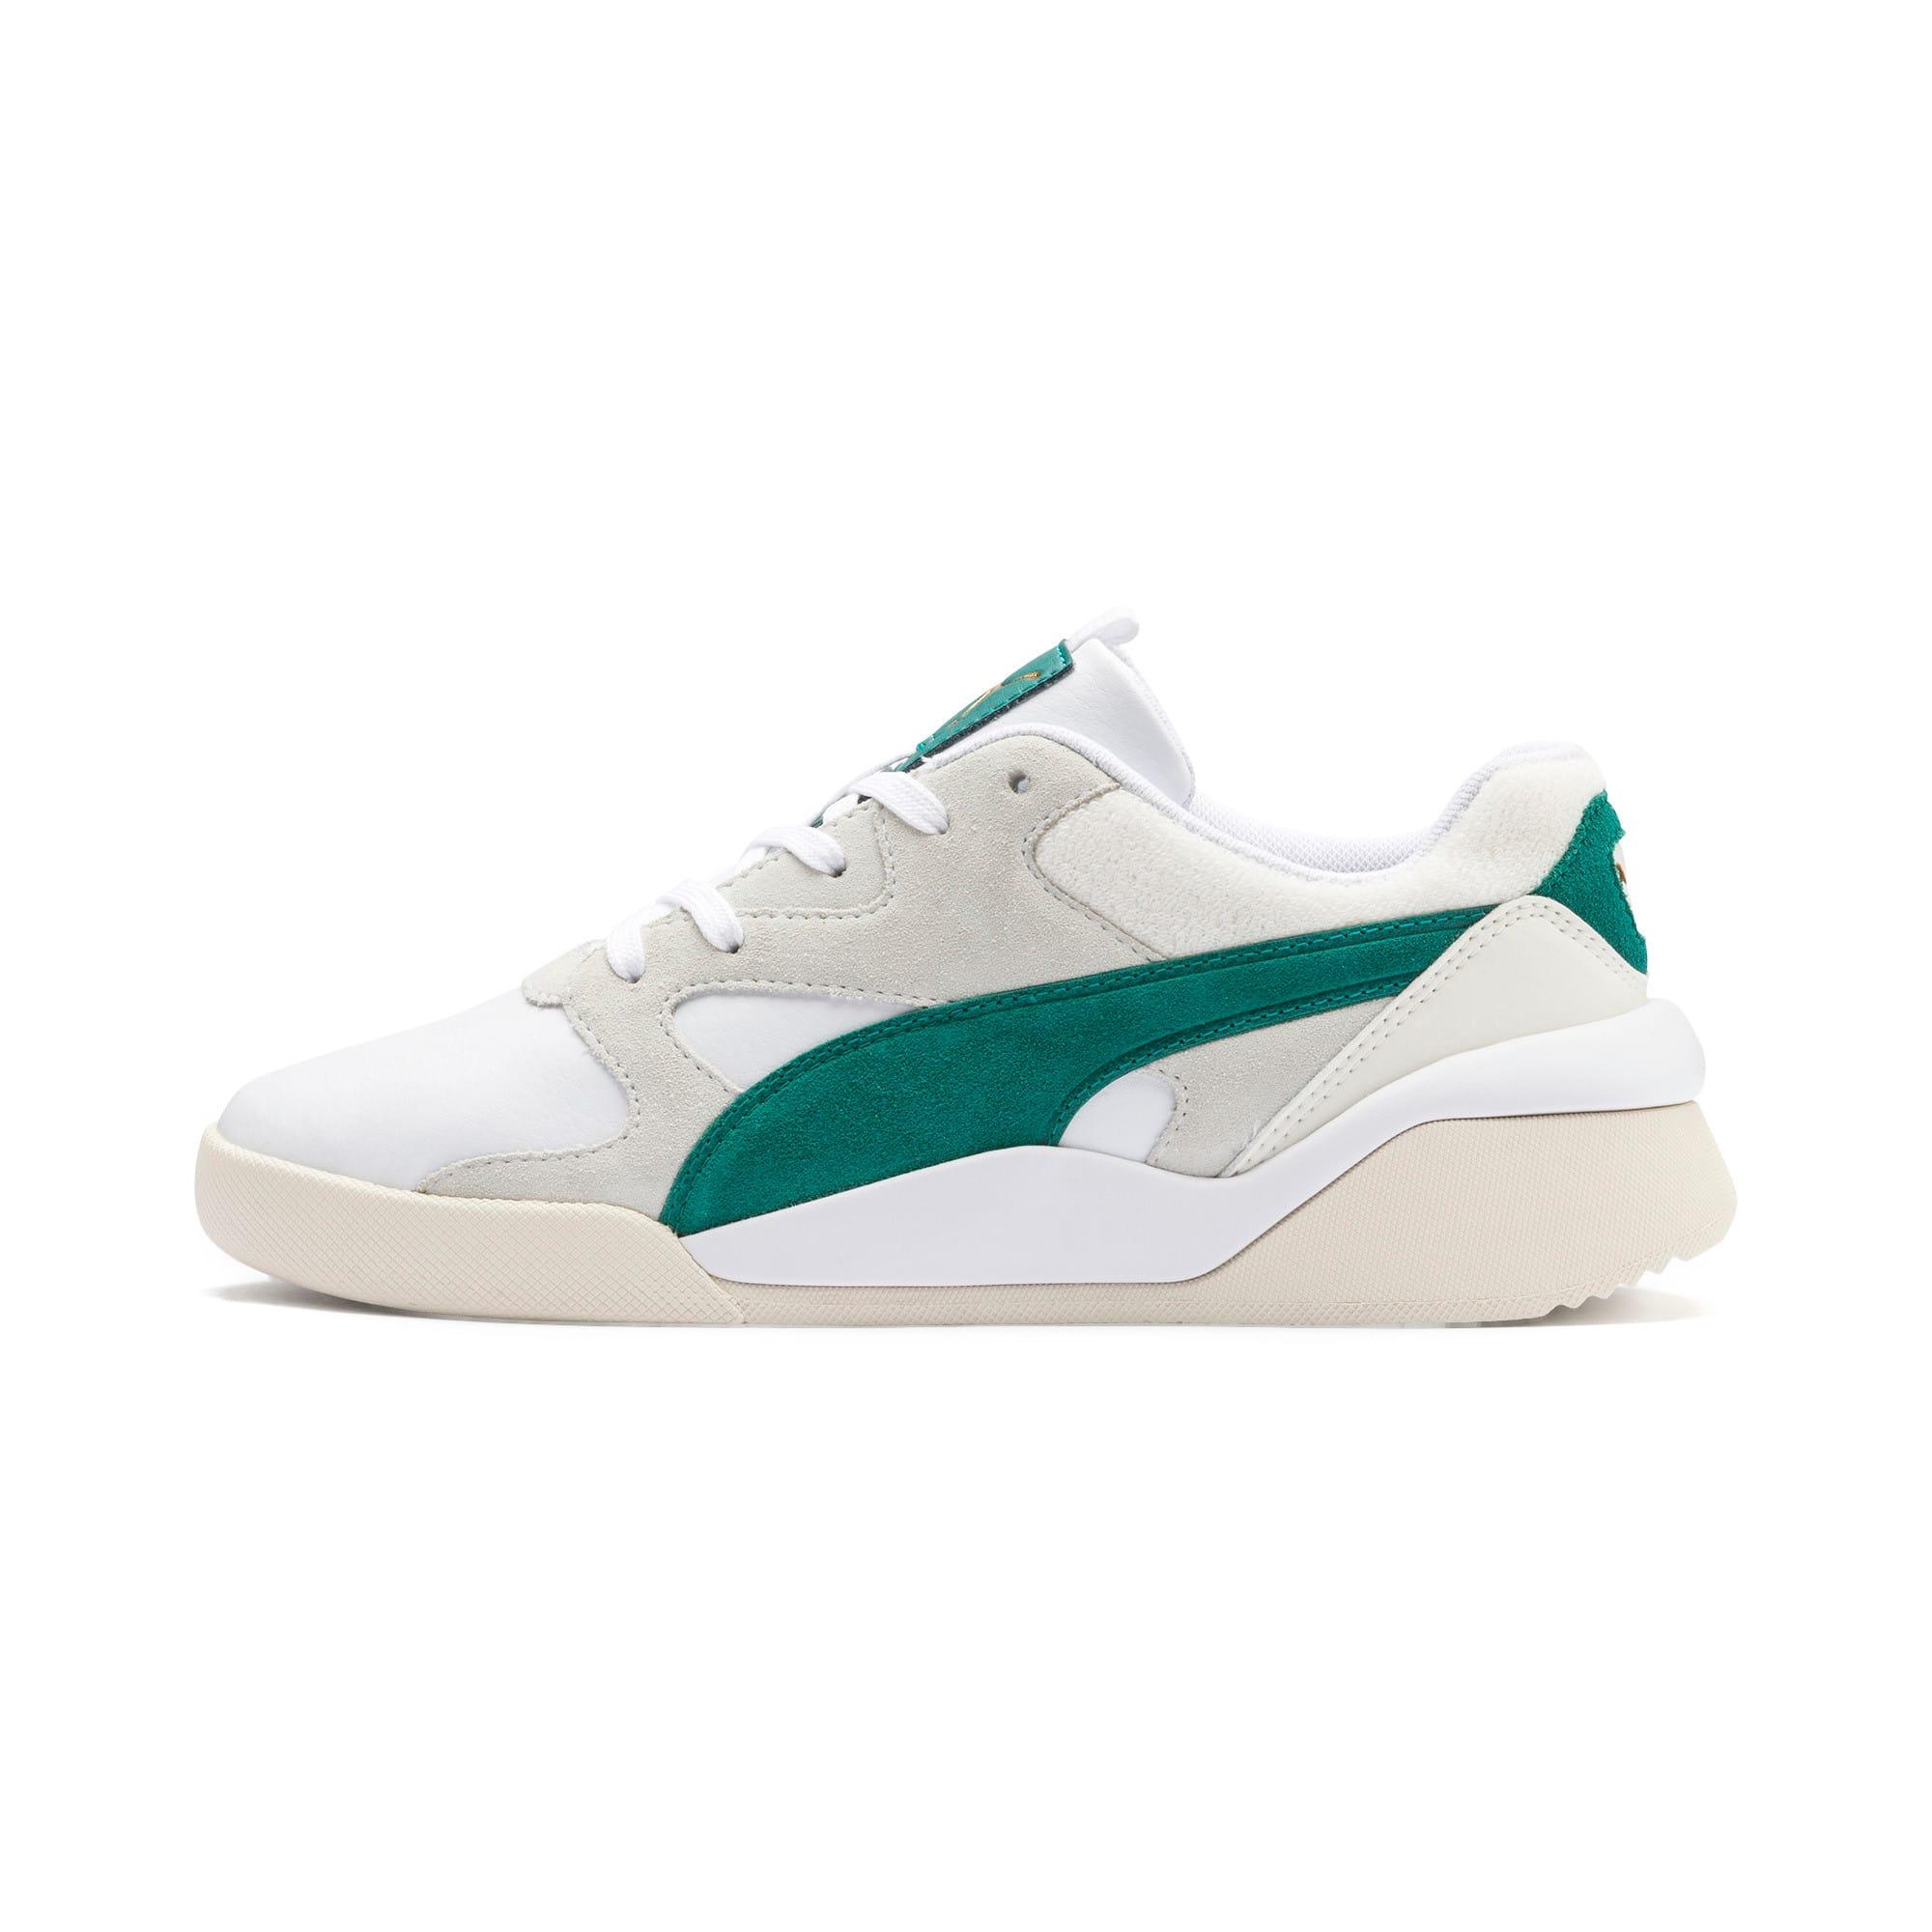 Thumbnail 1 of Aeon Heritage Women's Sneakers, Puma White-Teal Green, medium